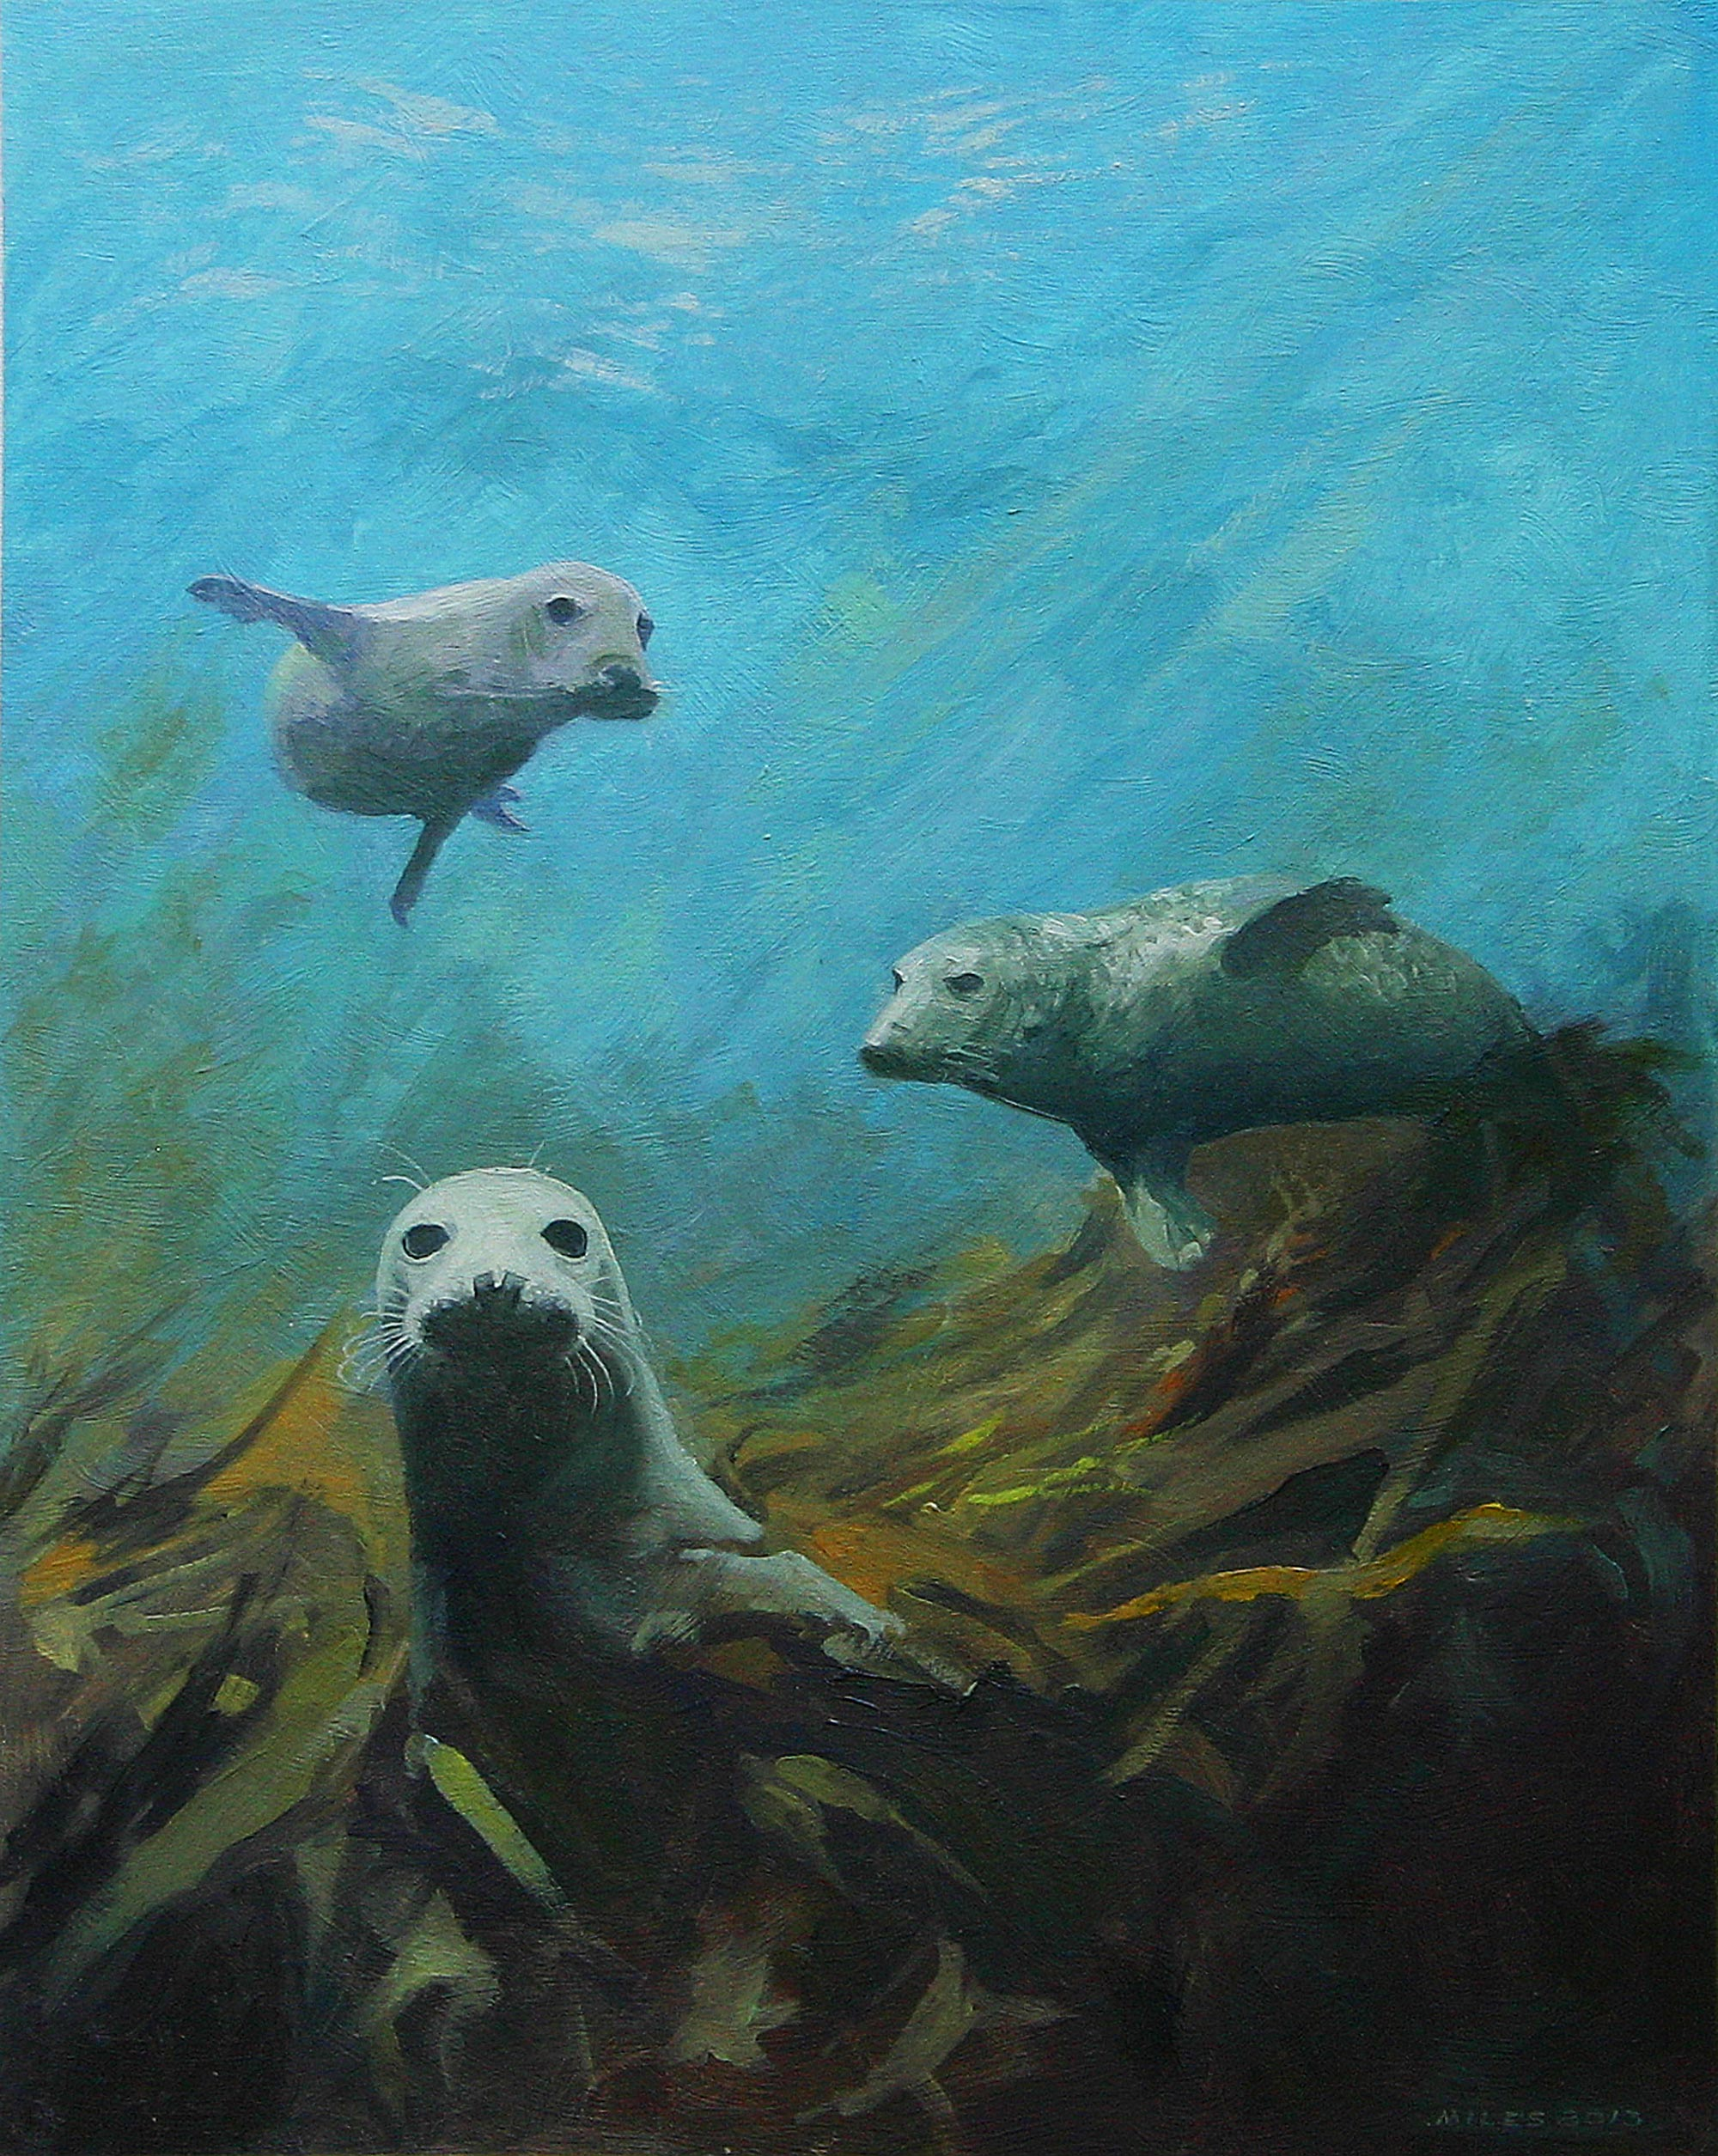 Gerry_Miles_divepaint_underwater_paintings_Grey_Seals_of_the_Scilly_Islands.jpg